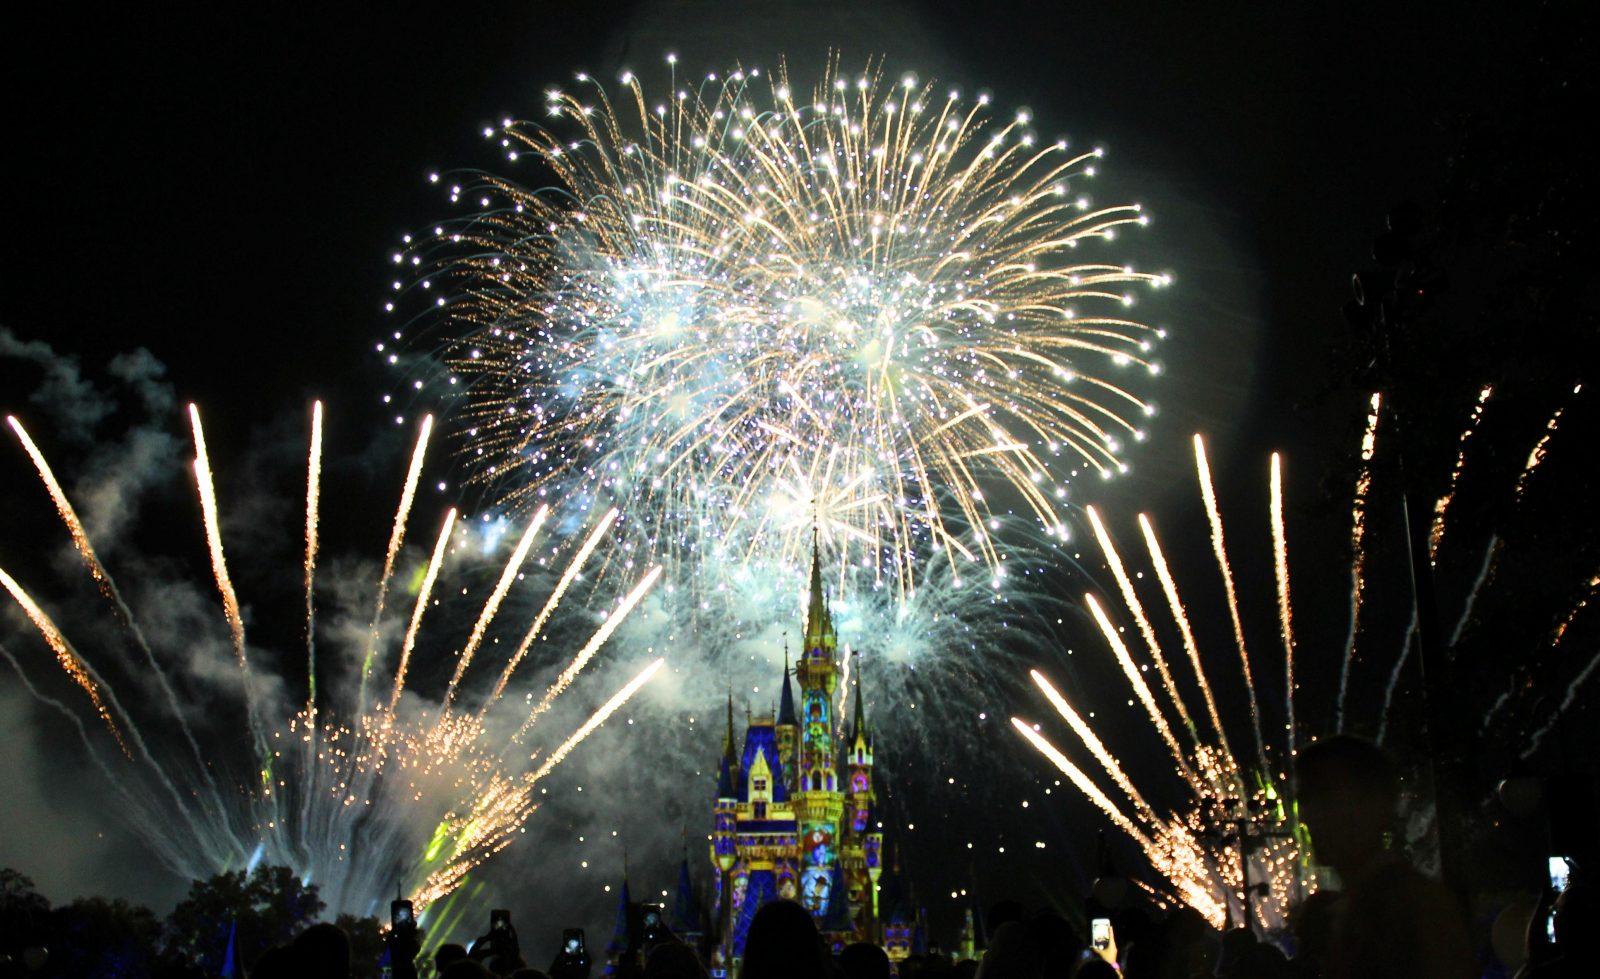 magic kingdom fireworks over cinderella castle